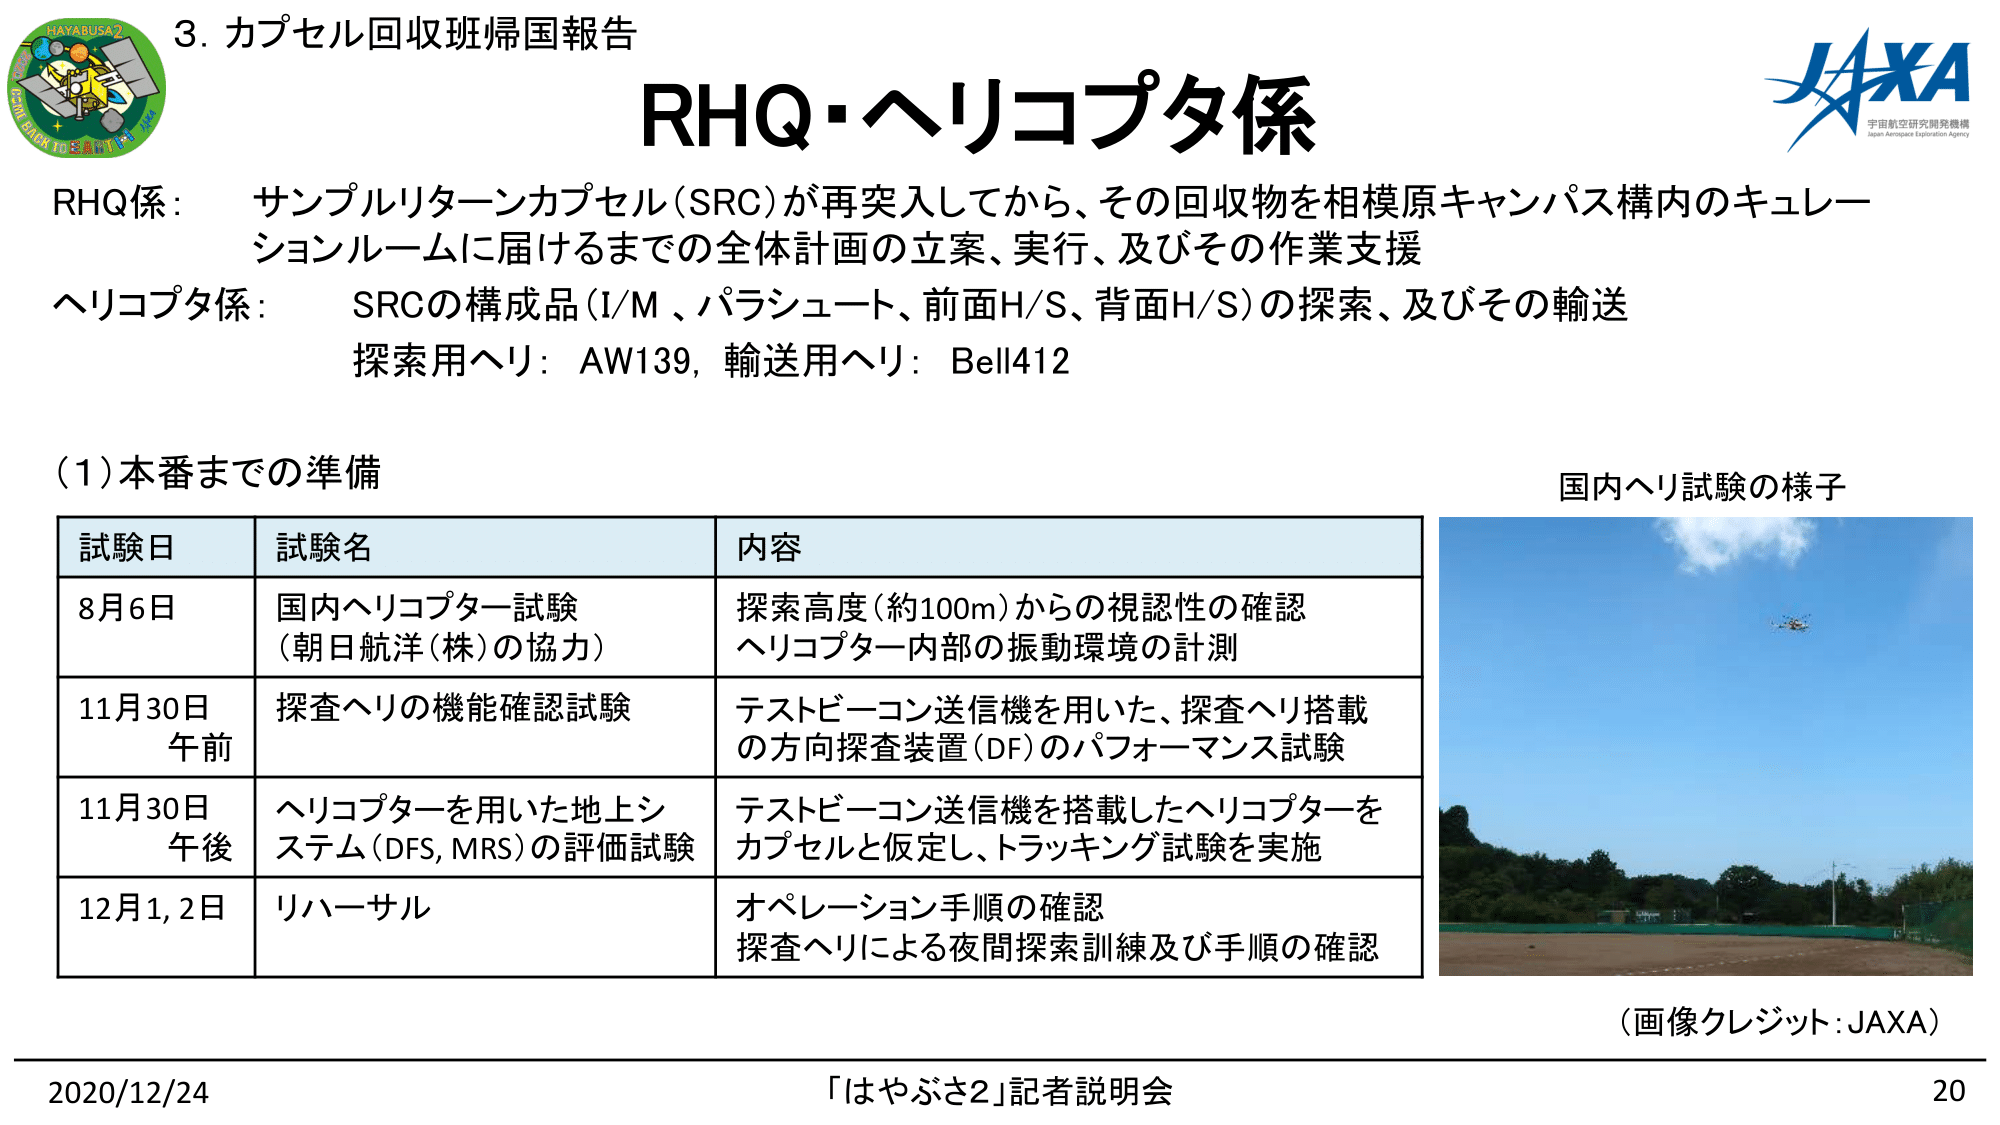 f:id:Imamura:20201224135208p:plain